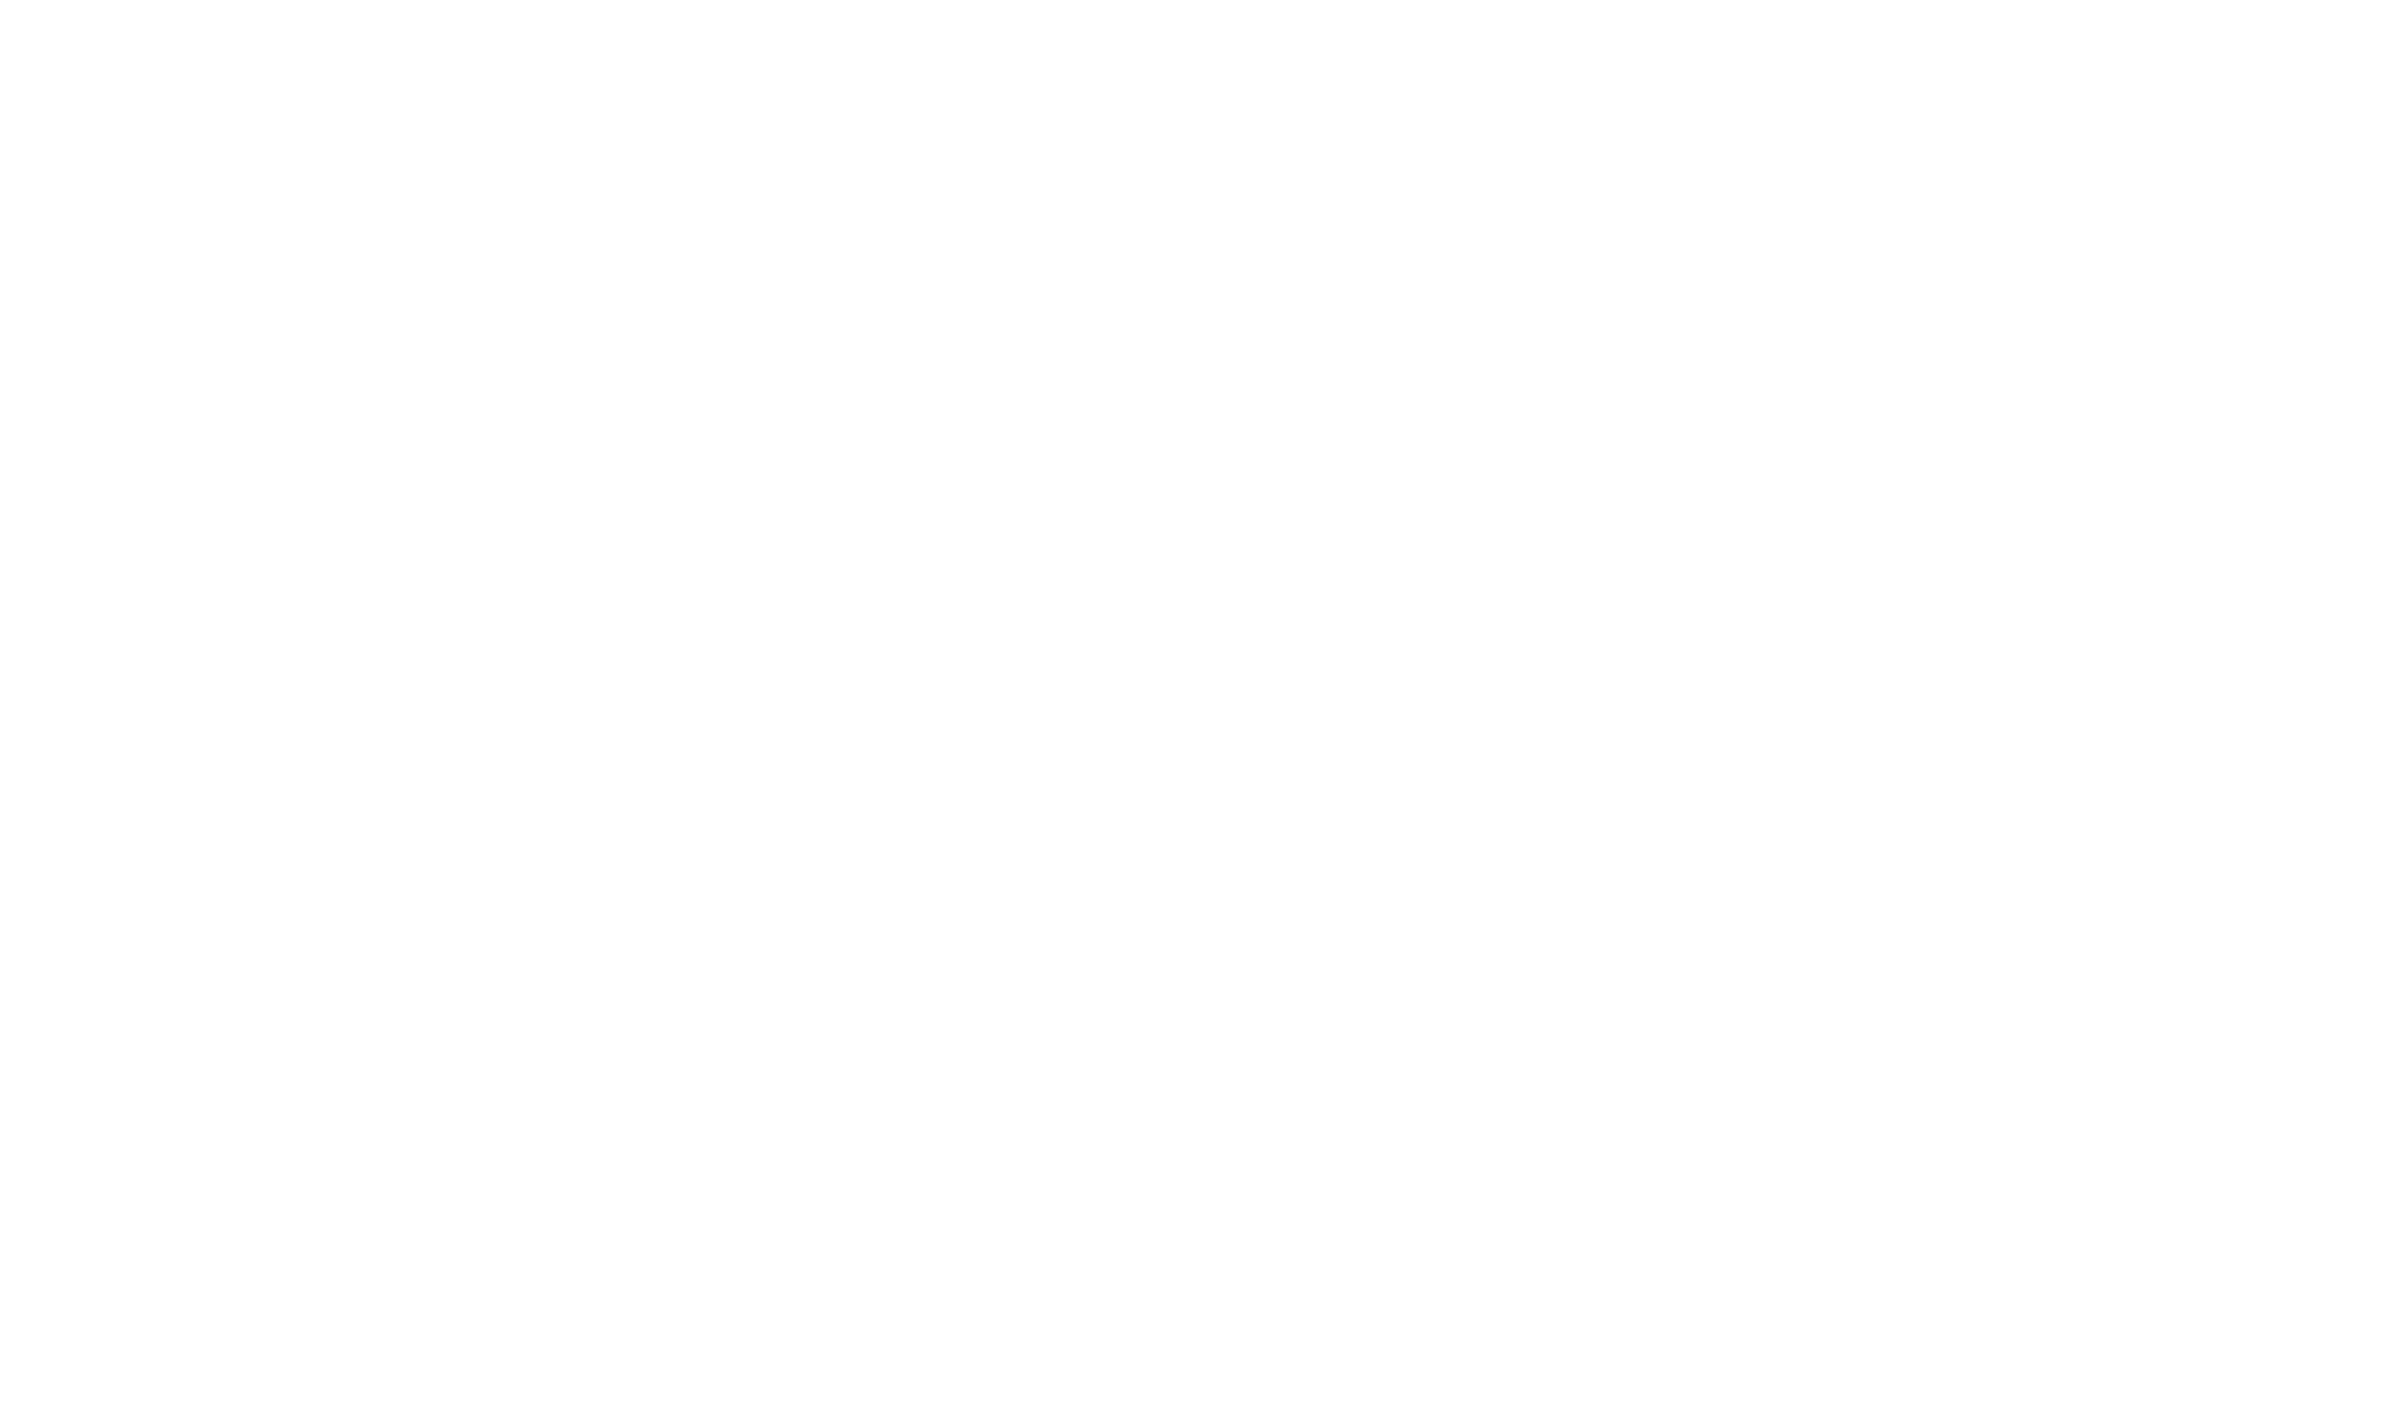 soccer AM logo